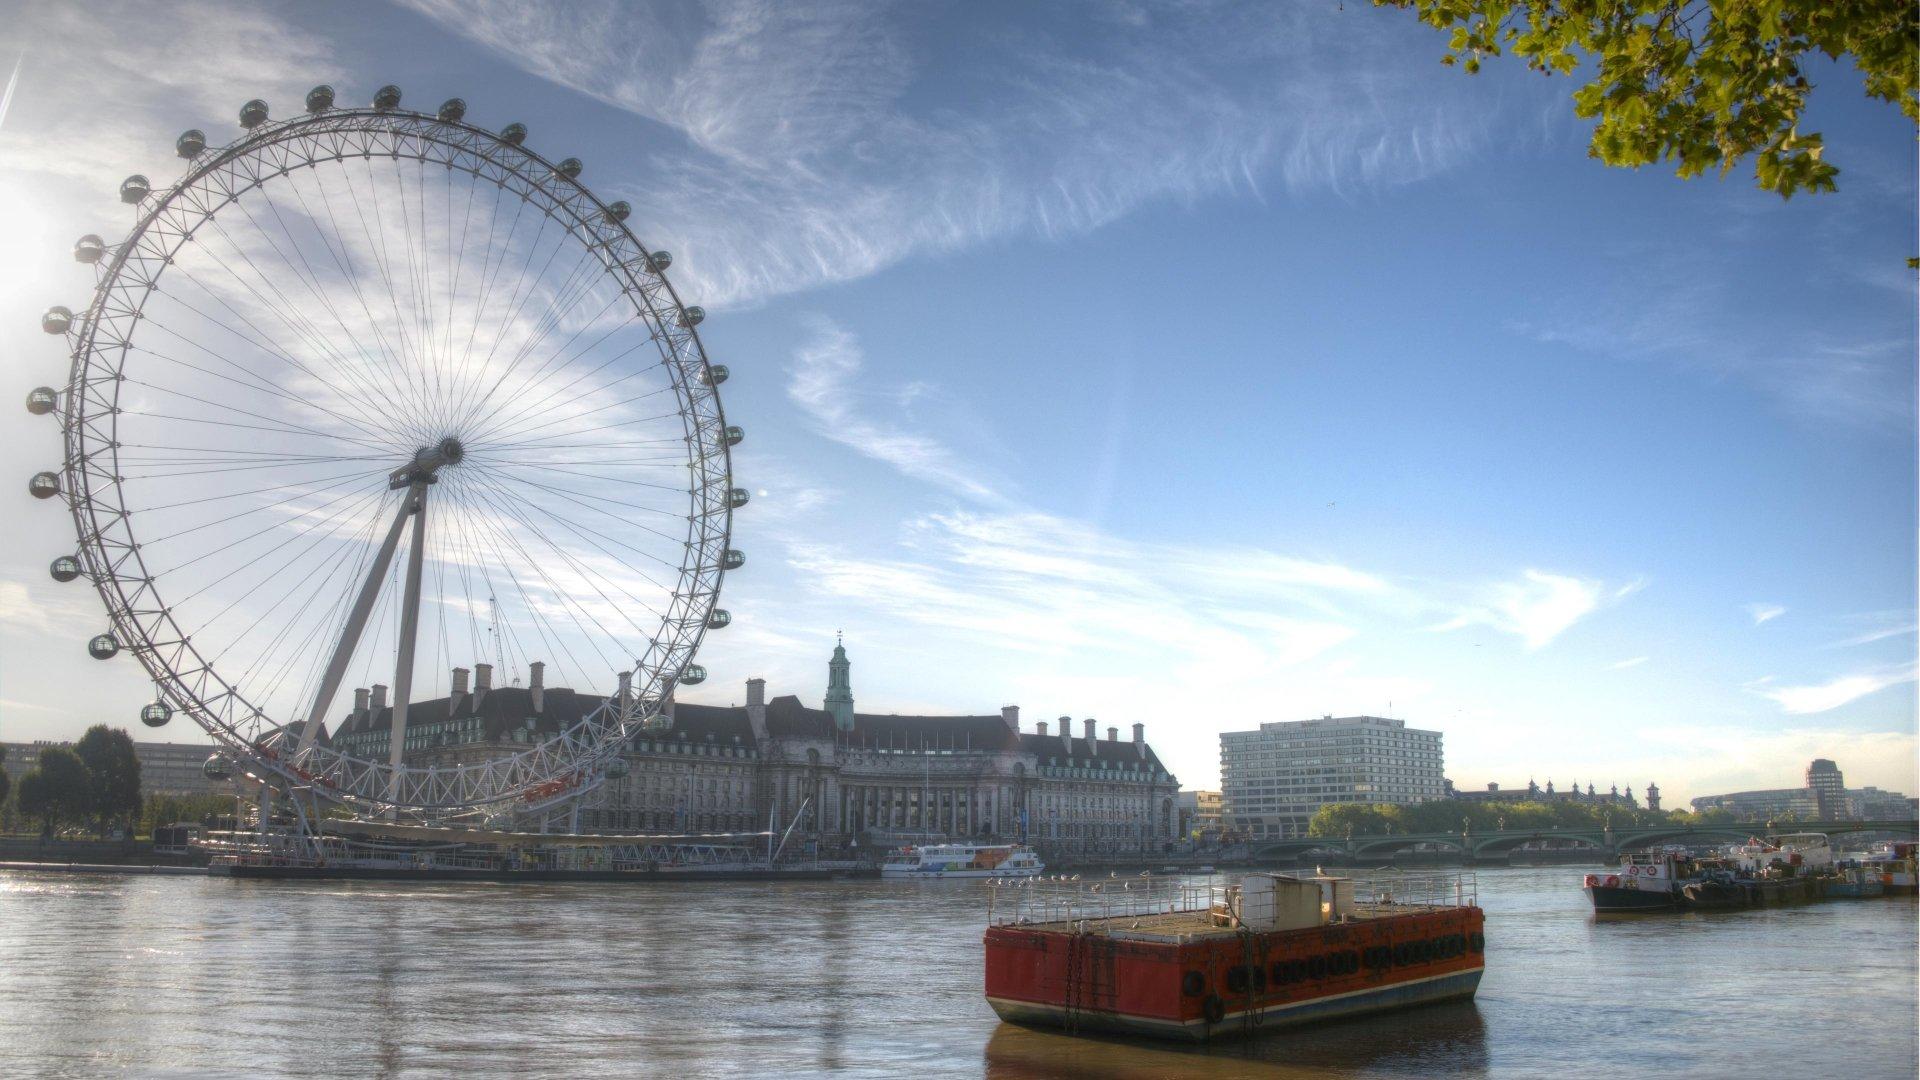 london eye 4k ultra hd wallpaper and background image